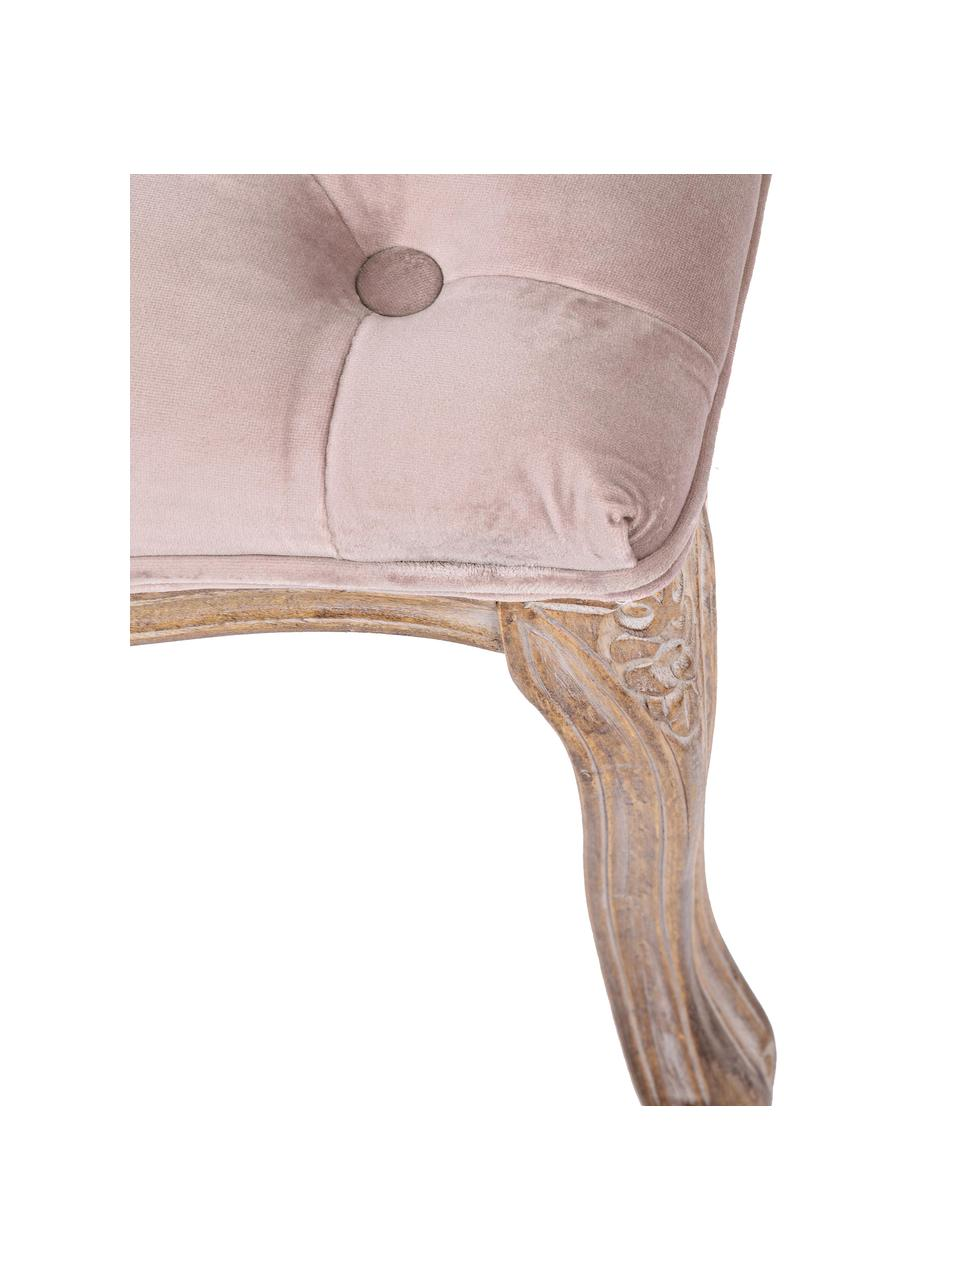 Samt-Sitzbank Mathilde im Barock Stil, Bezug: Polyestersamt Der Bezug w, Gestell: Birkenholz, Nitrozellulos, Altrosa, Birkenholz, 110 x 47 cm